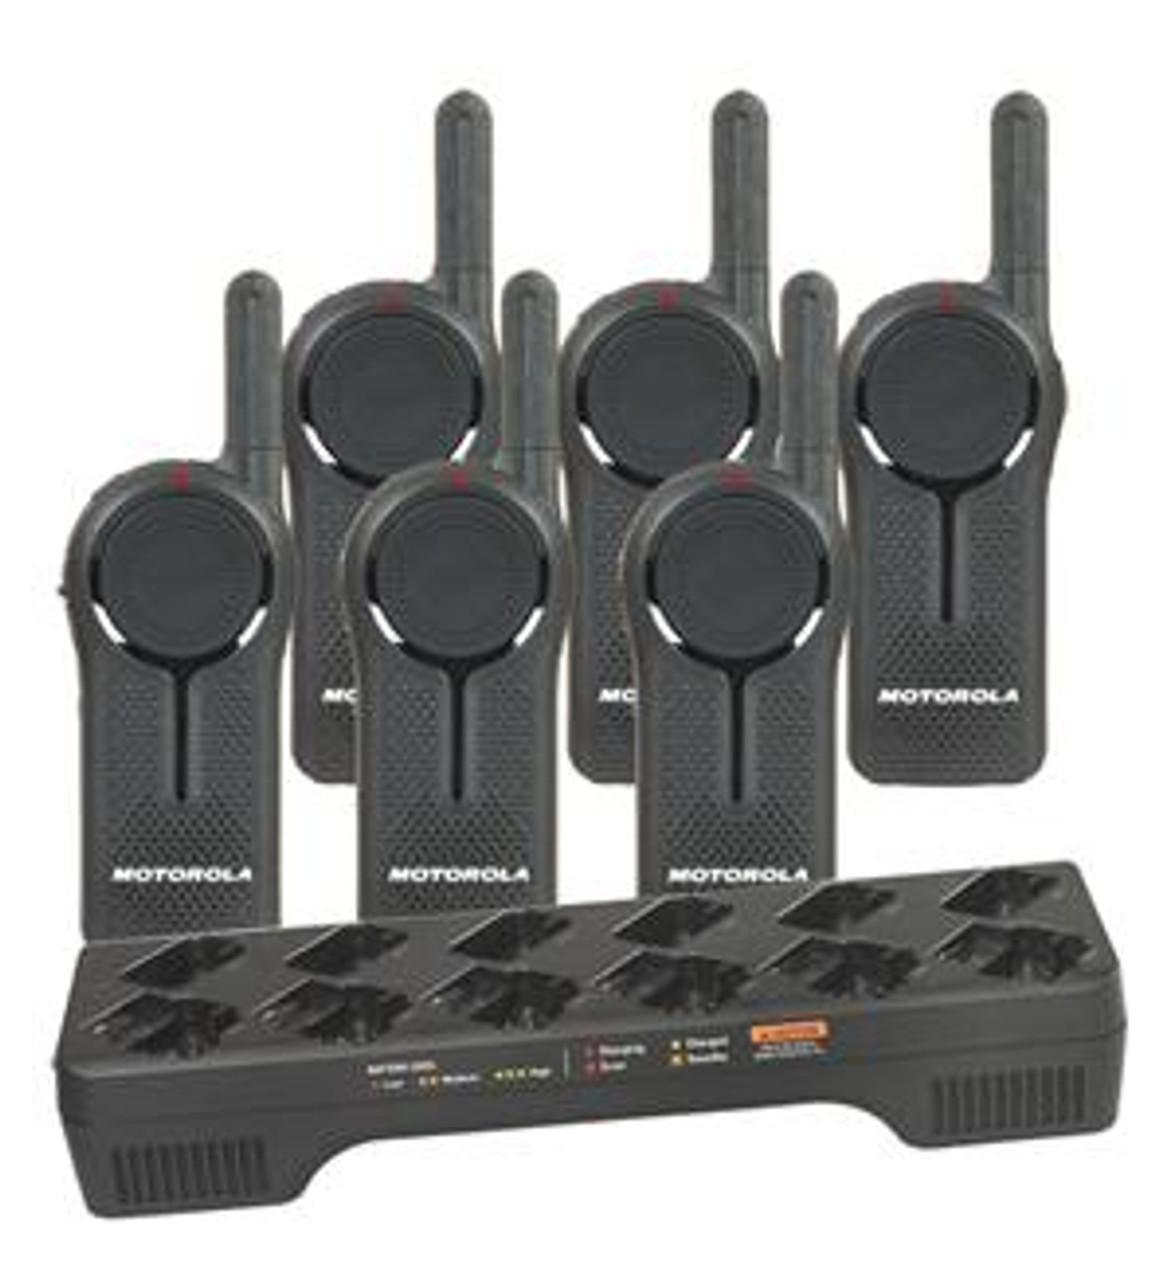 Motorola DLR1020 Digital Way Radio Six Pack with Multi-Unit Charging Tray